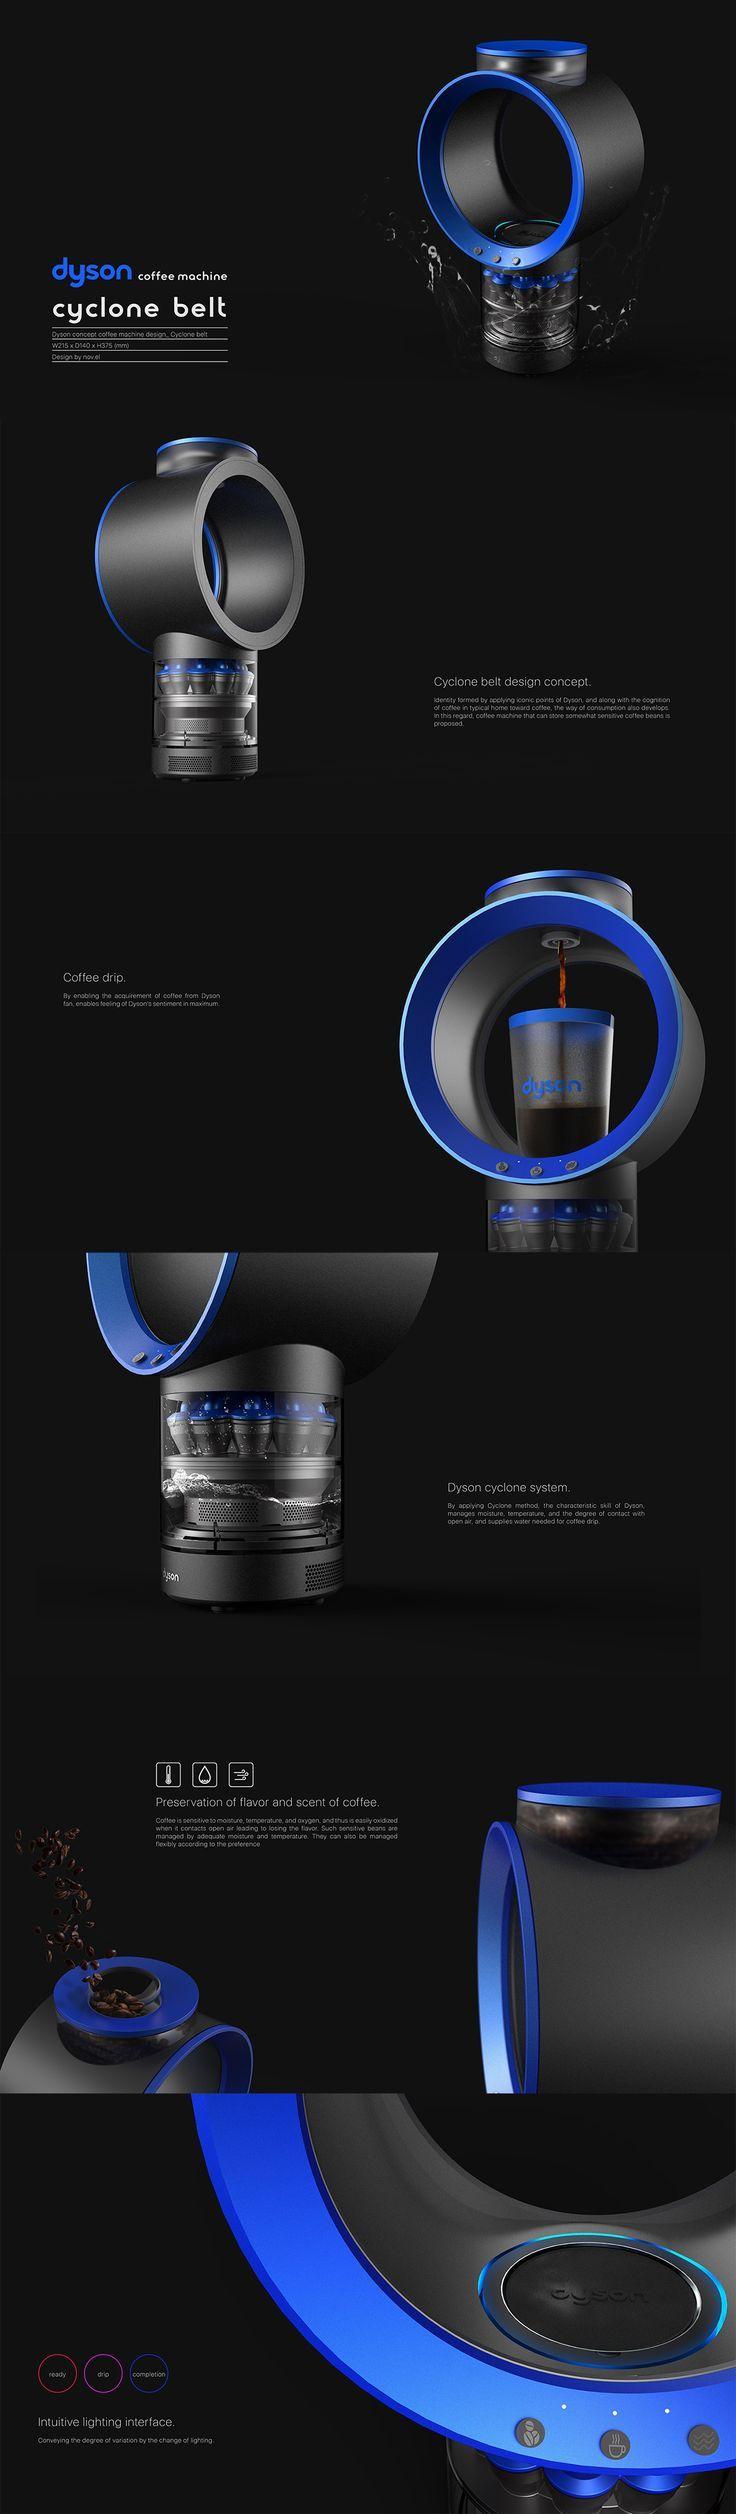 Product design / Industrial design / 제품디자인 / 산업디자인 ...